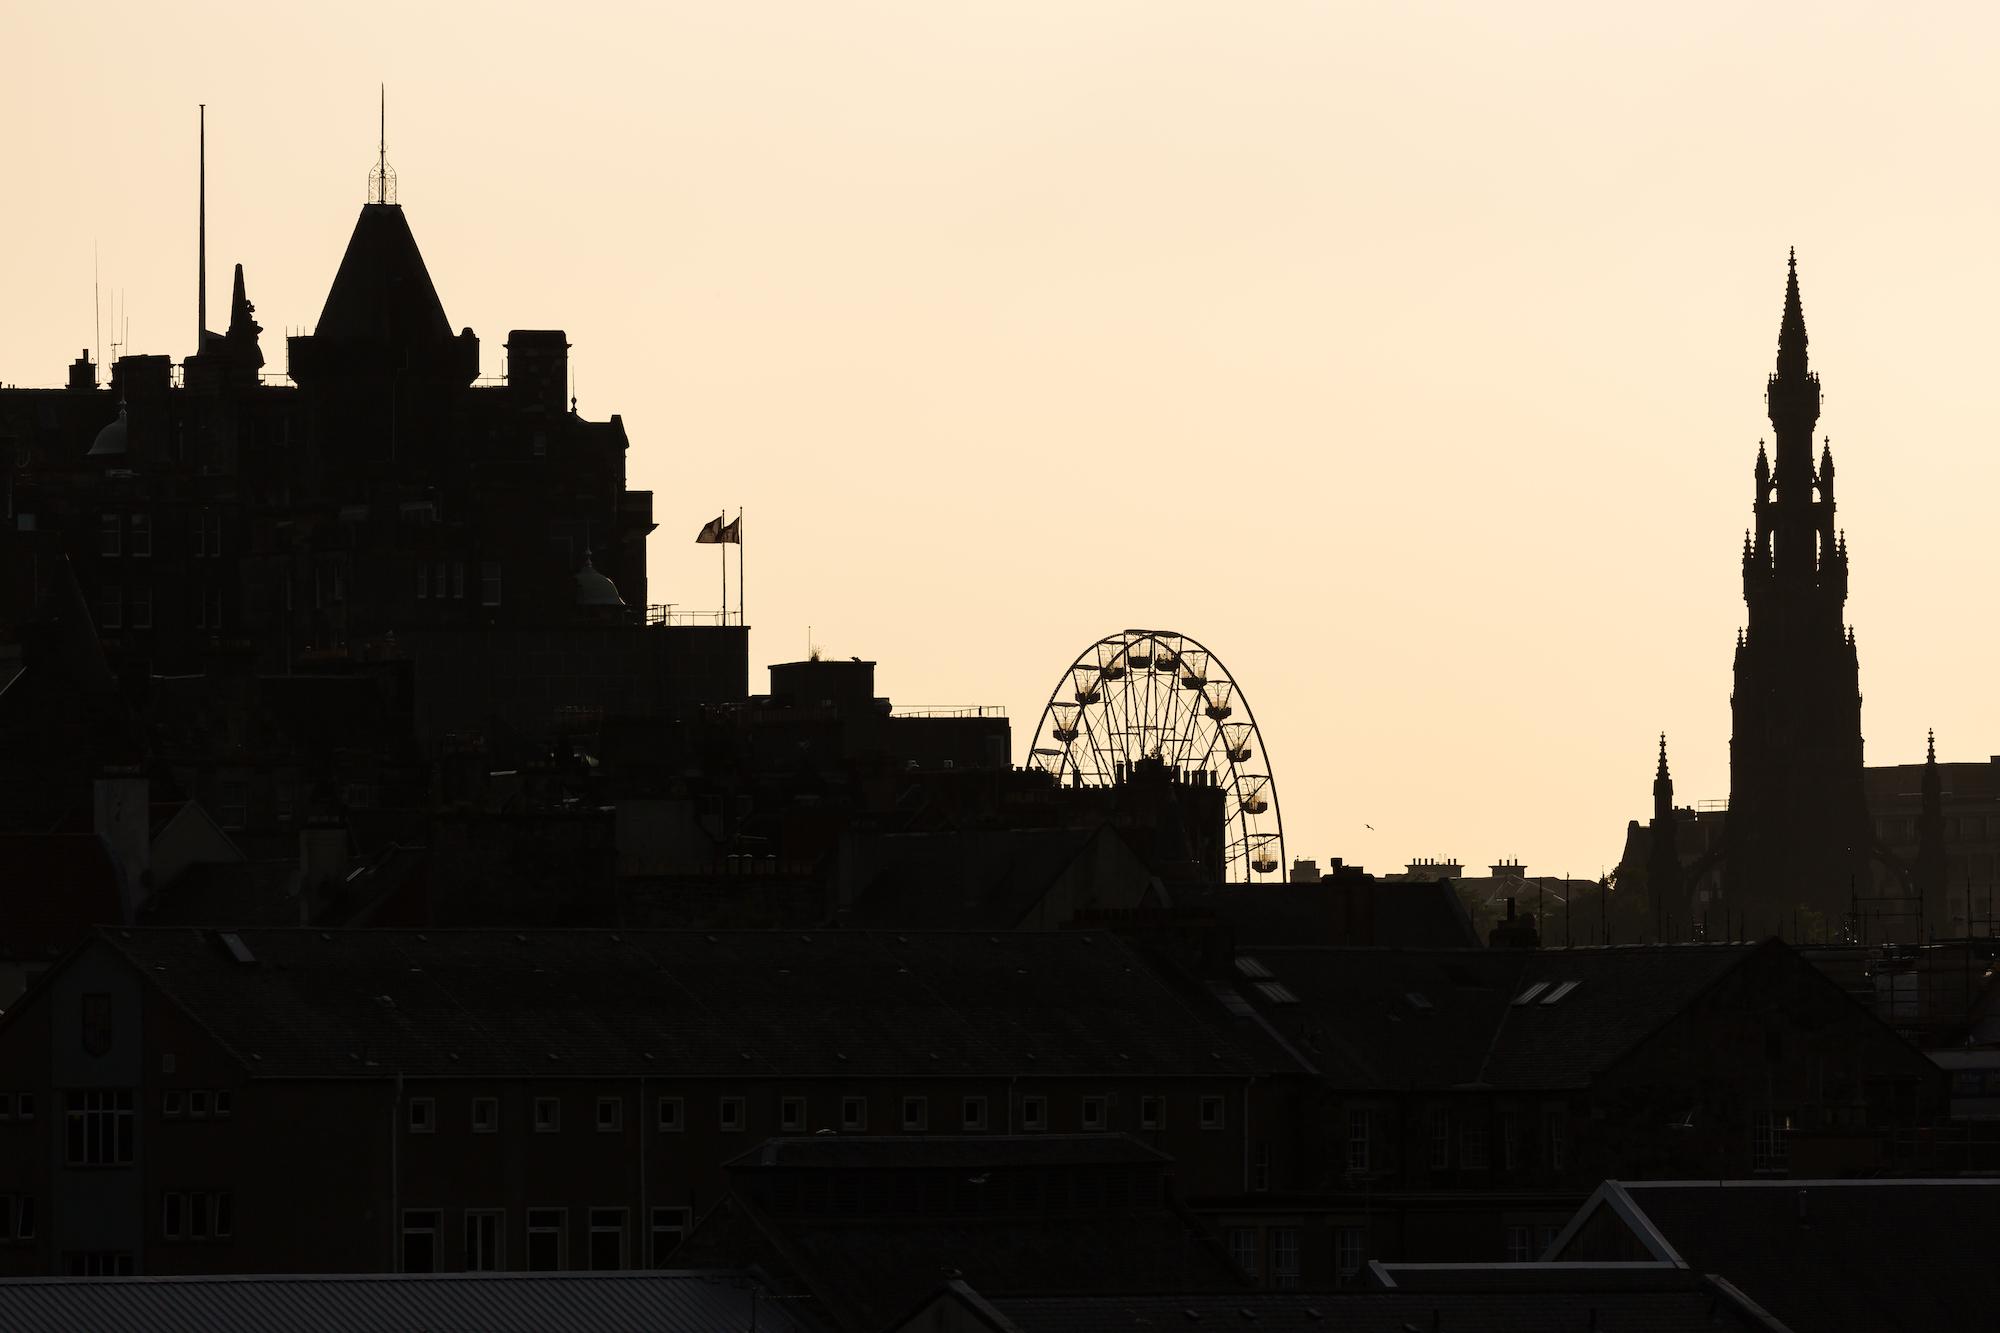 (217) (PO) Festival Ferris Wheel and Walter Scott Monument, Princes Street, Edinburgh, Scotland.jpg